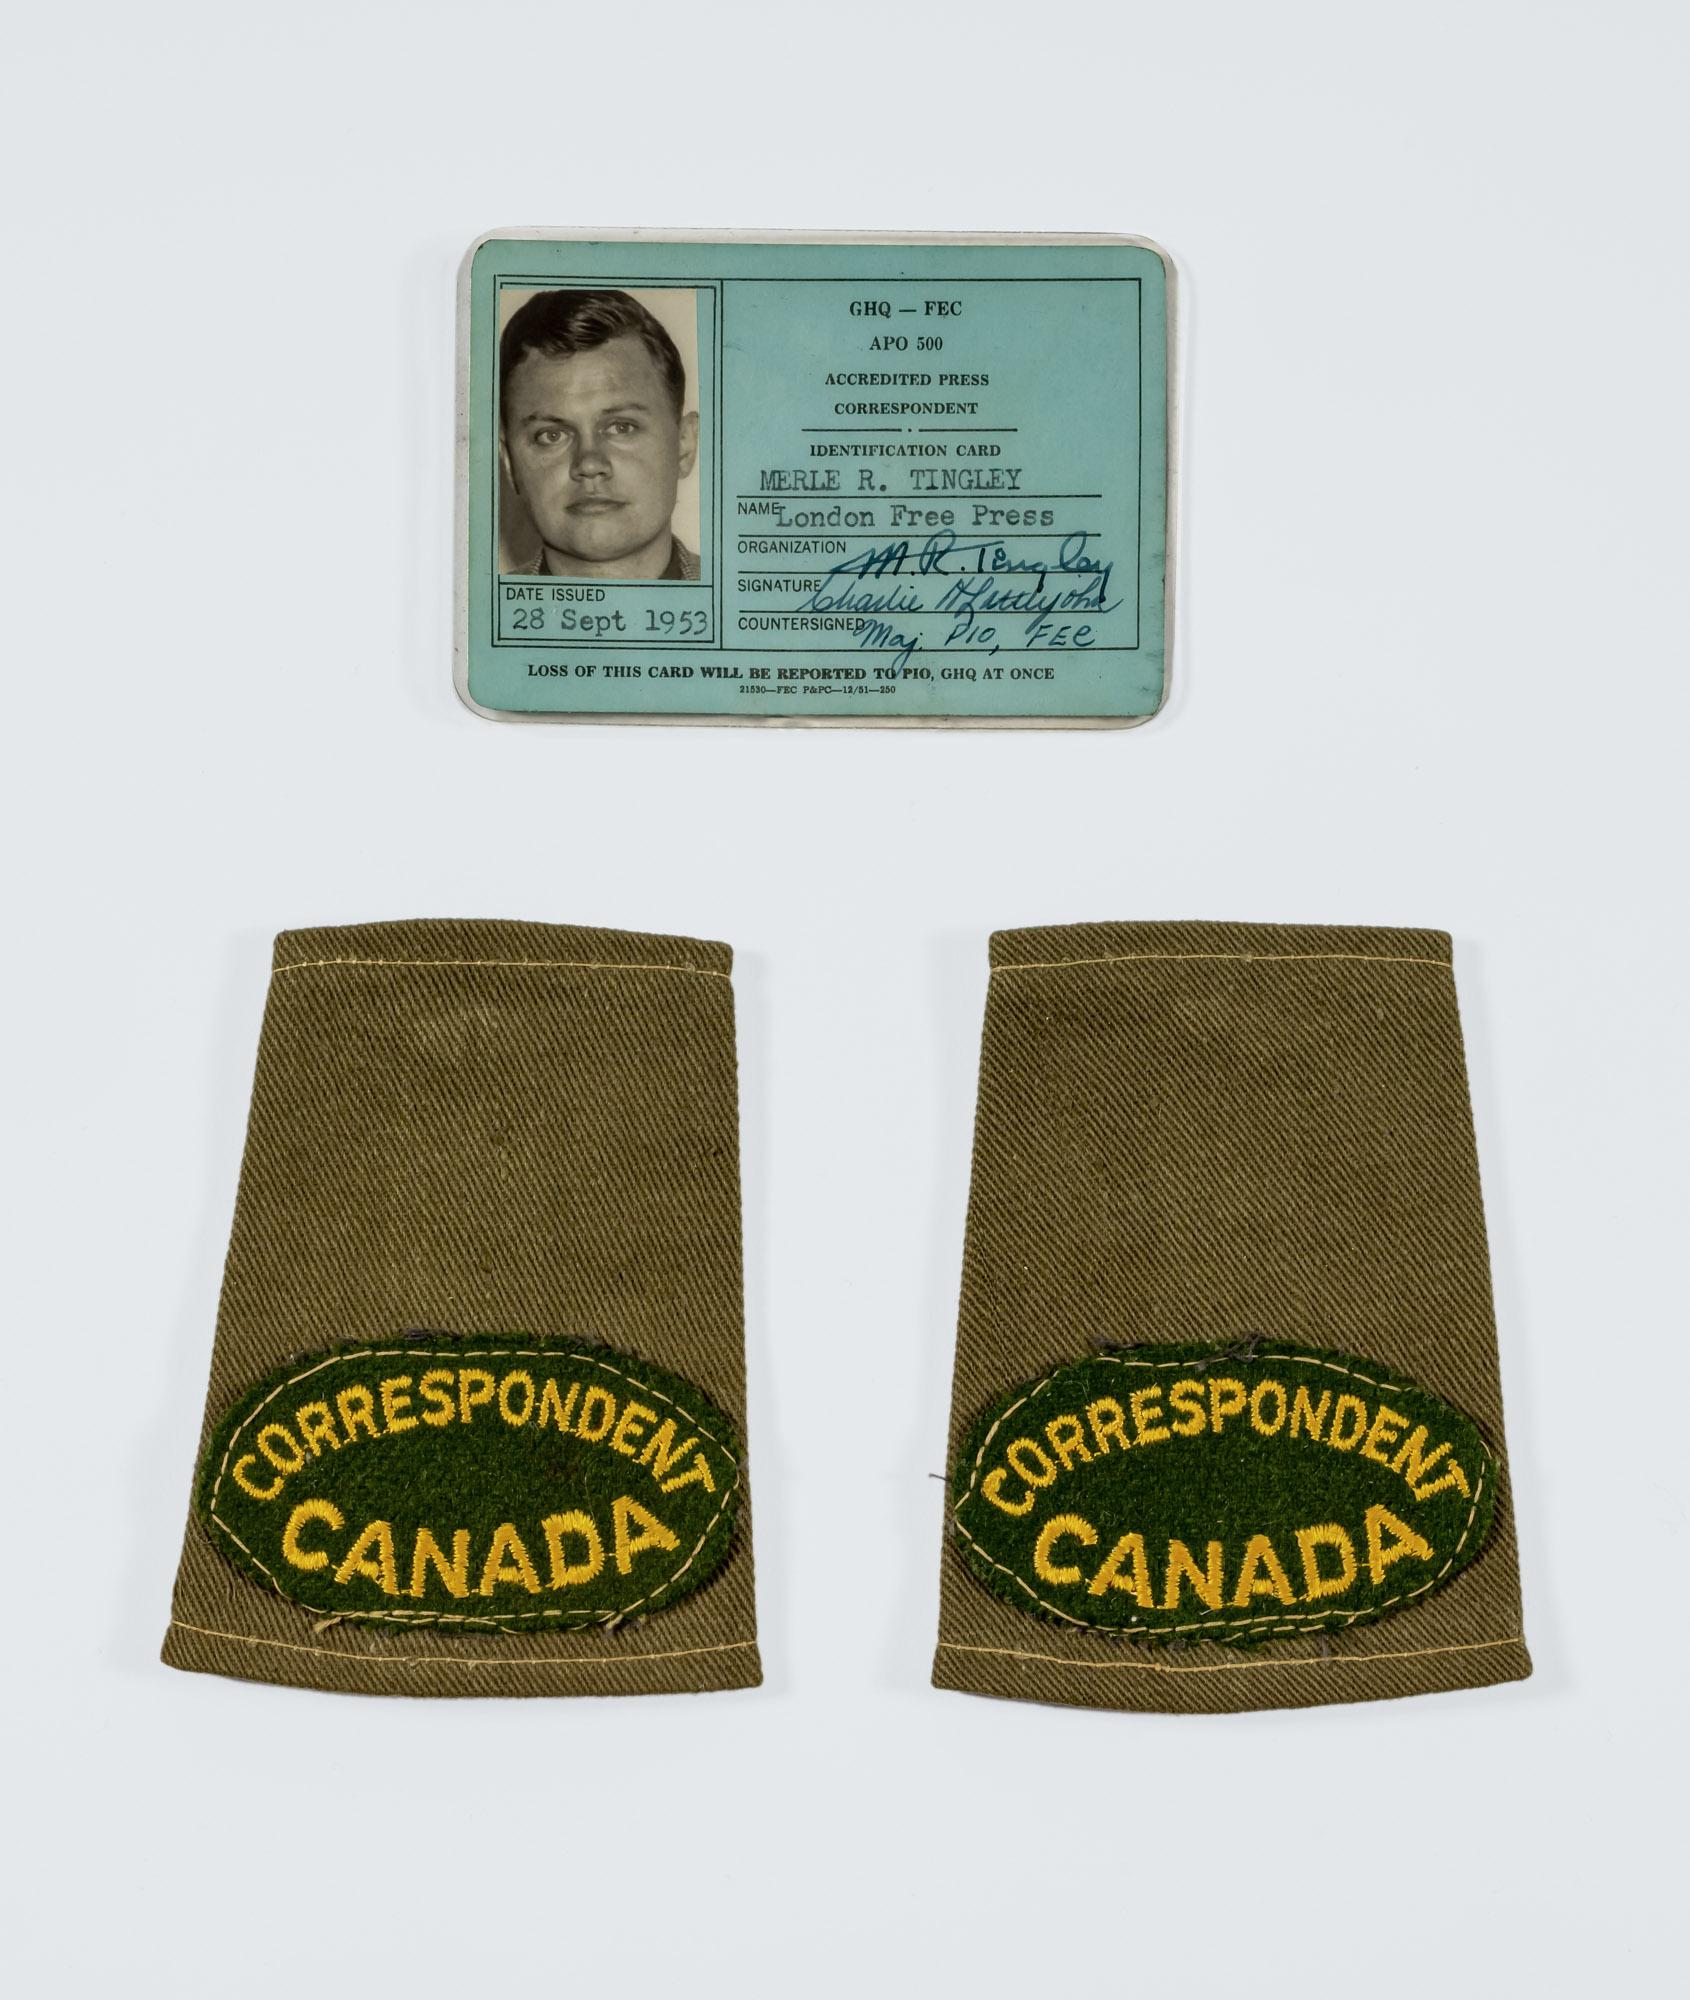 Merle Tingley's Korean War Press Card and Epaulettes